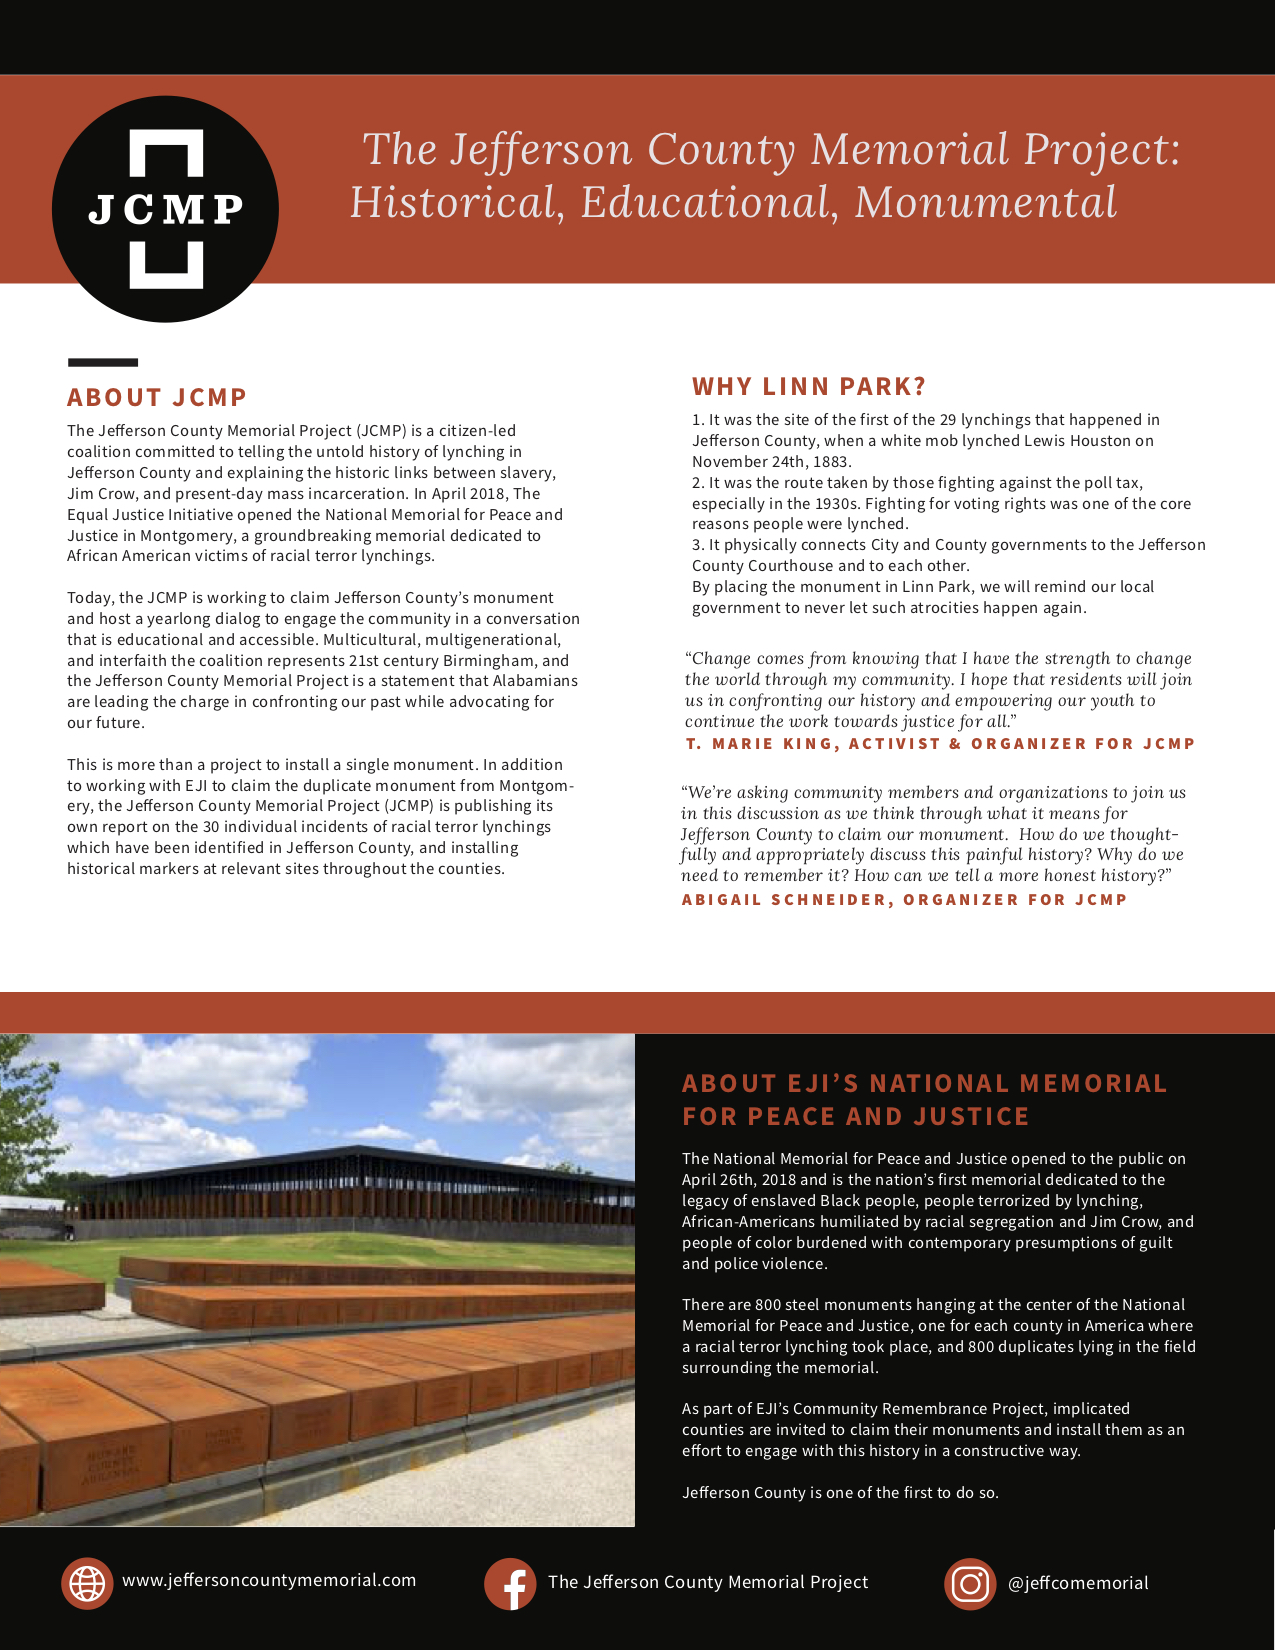 Jefferson County Memorial Project Press Kit.jpg